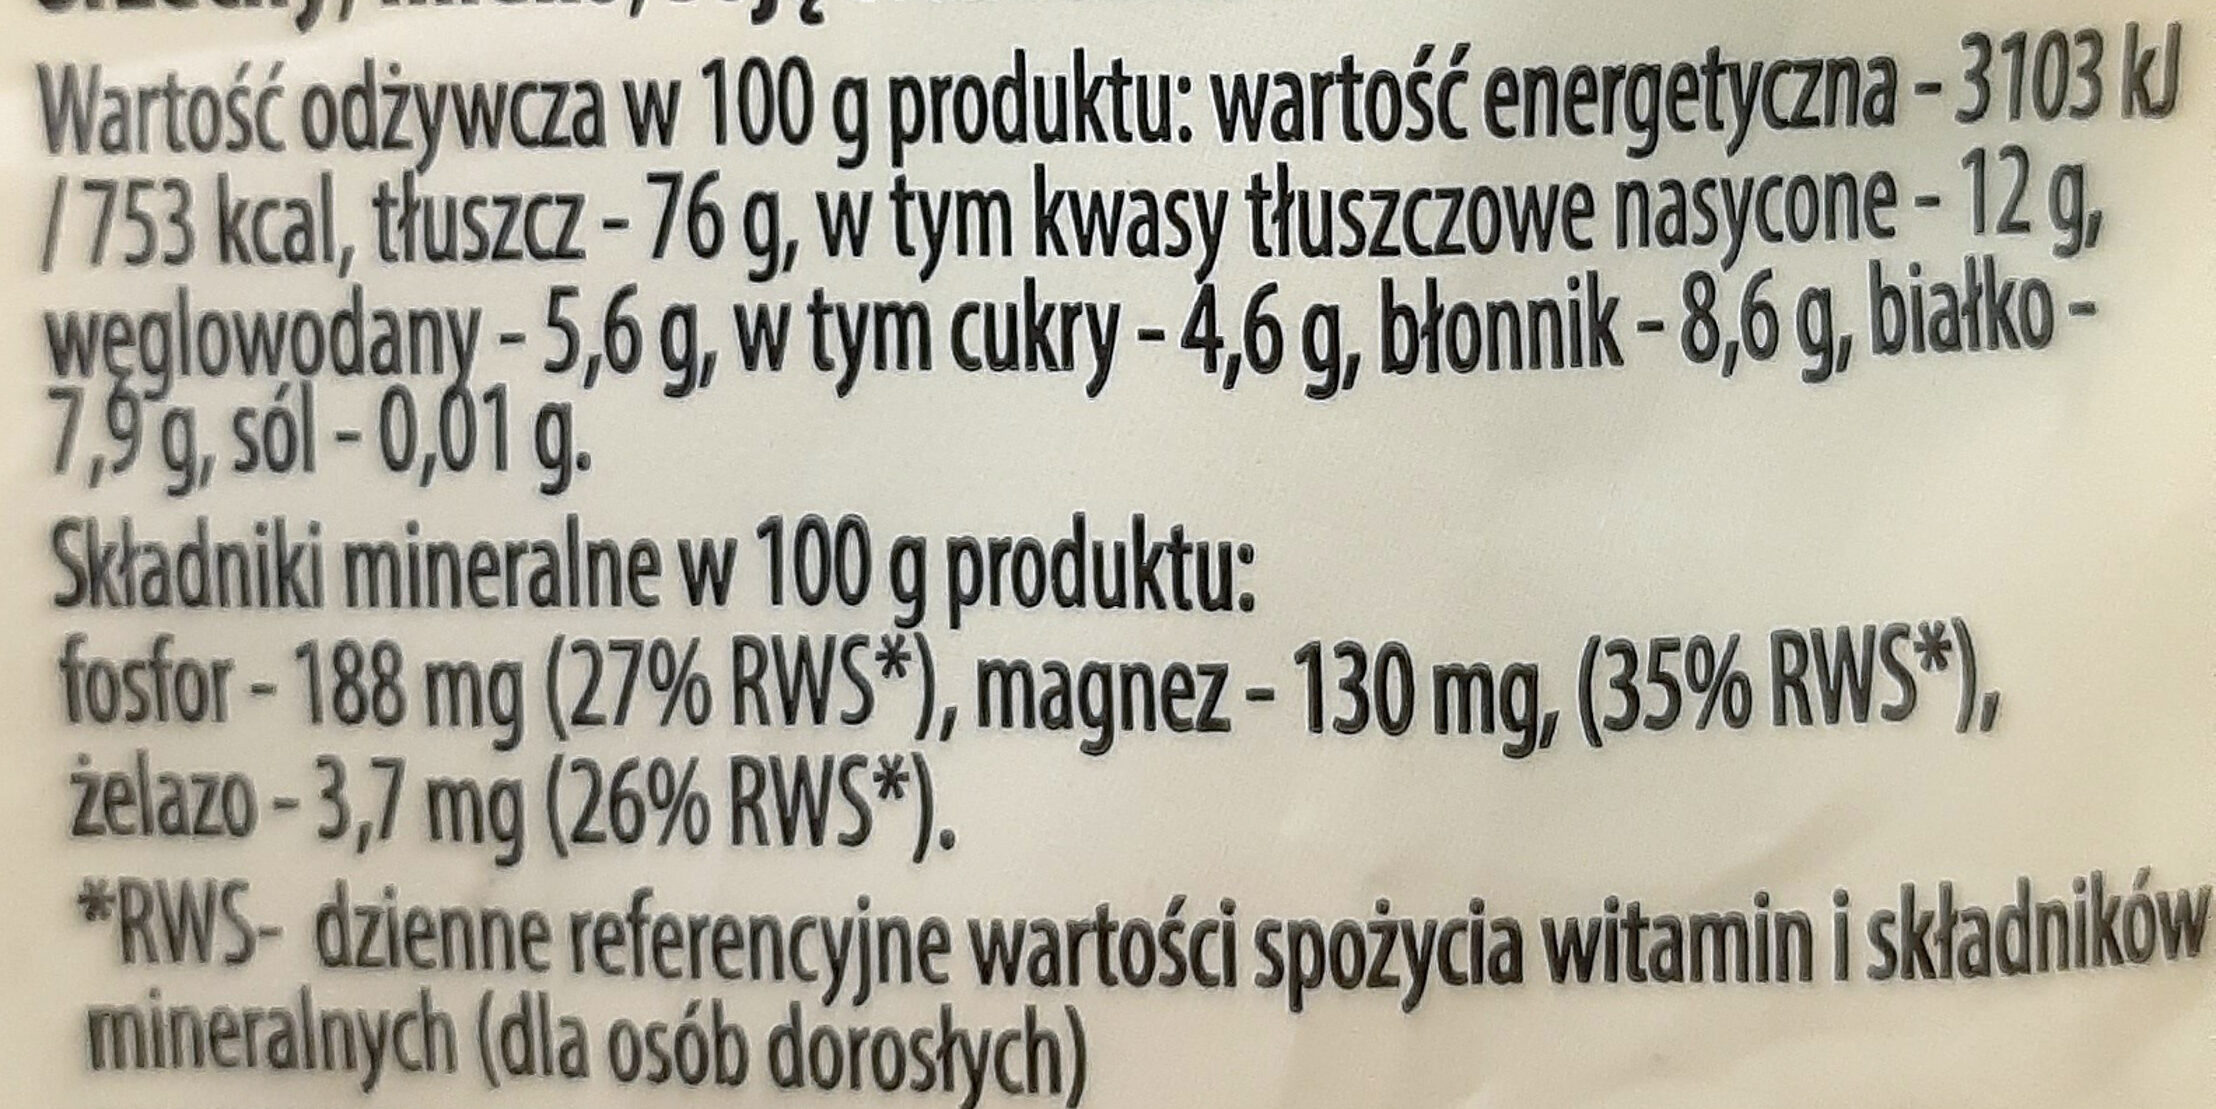 Orzechy makadamia łuskane - Nutrition facts - pl